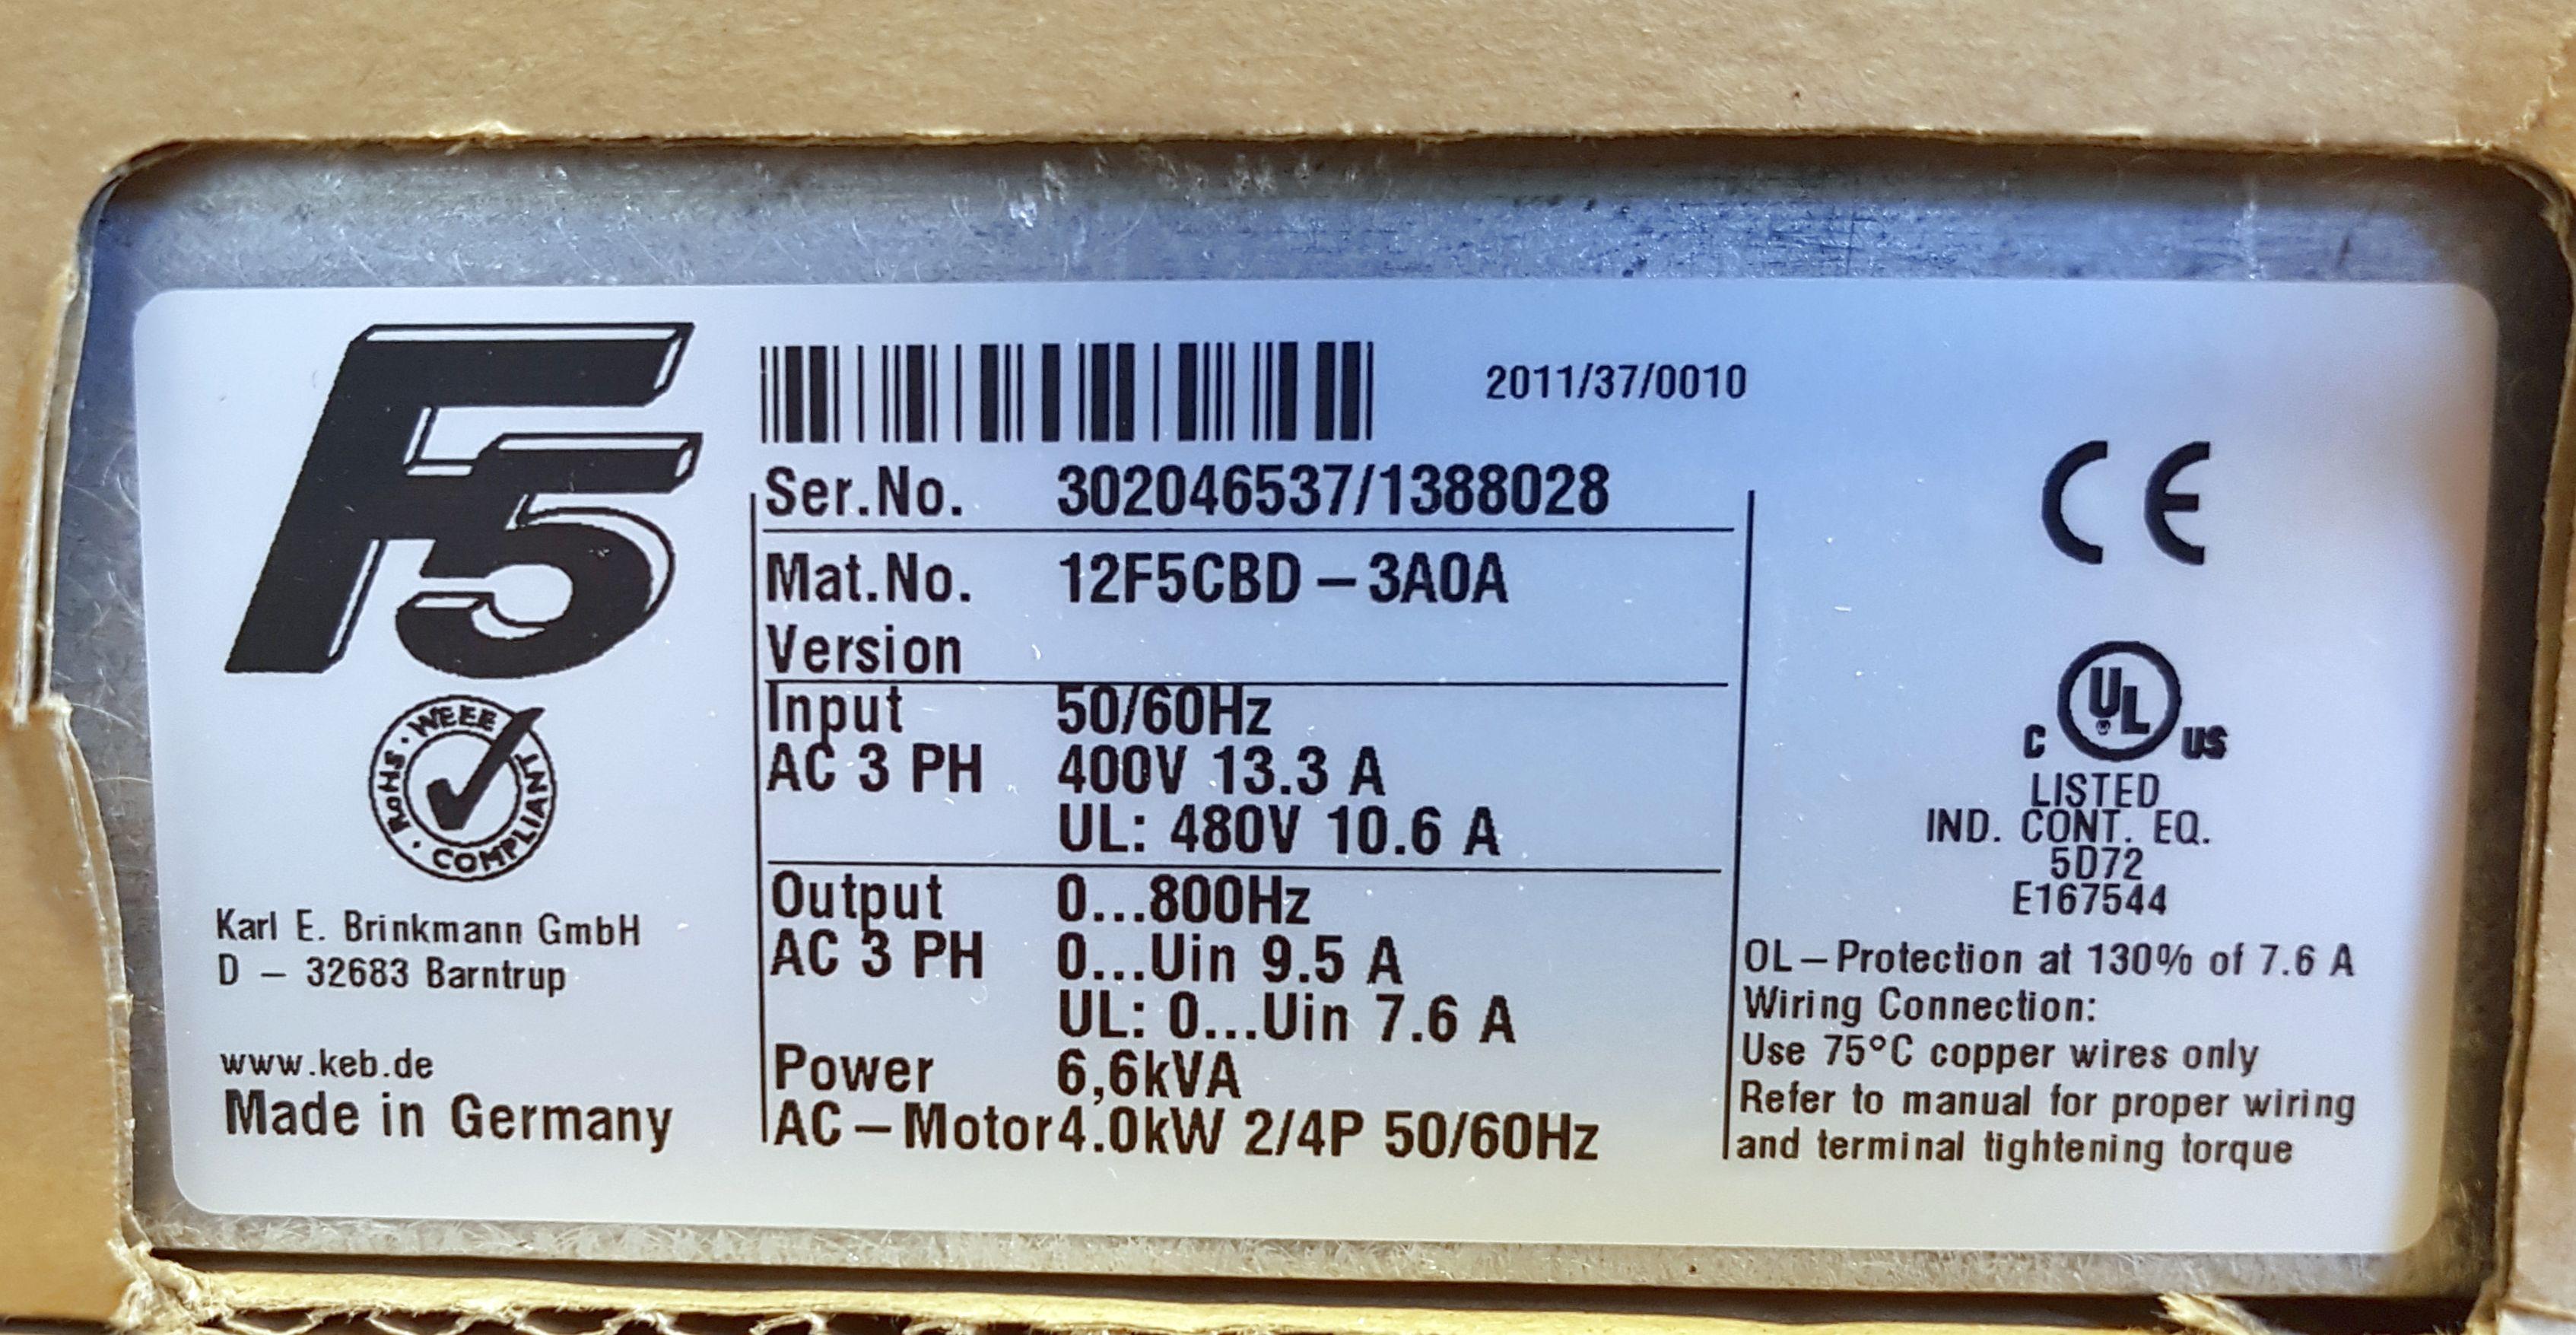 KEB Combivert Inverter F5,12 F5 CBD-3A0A,12F5CBD3A0A